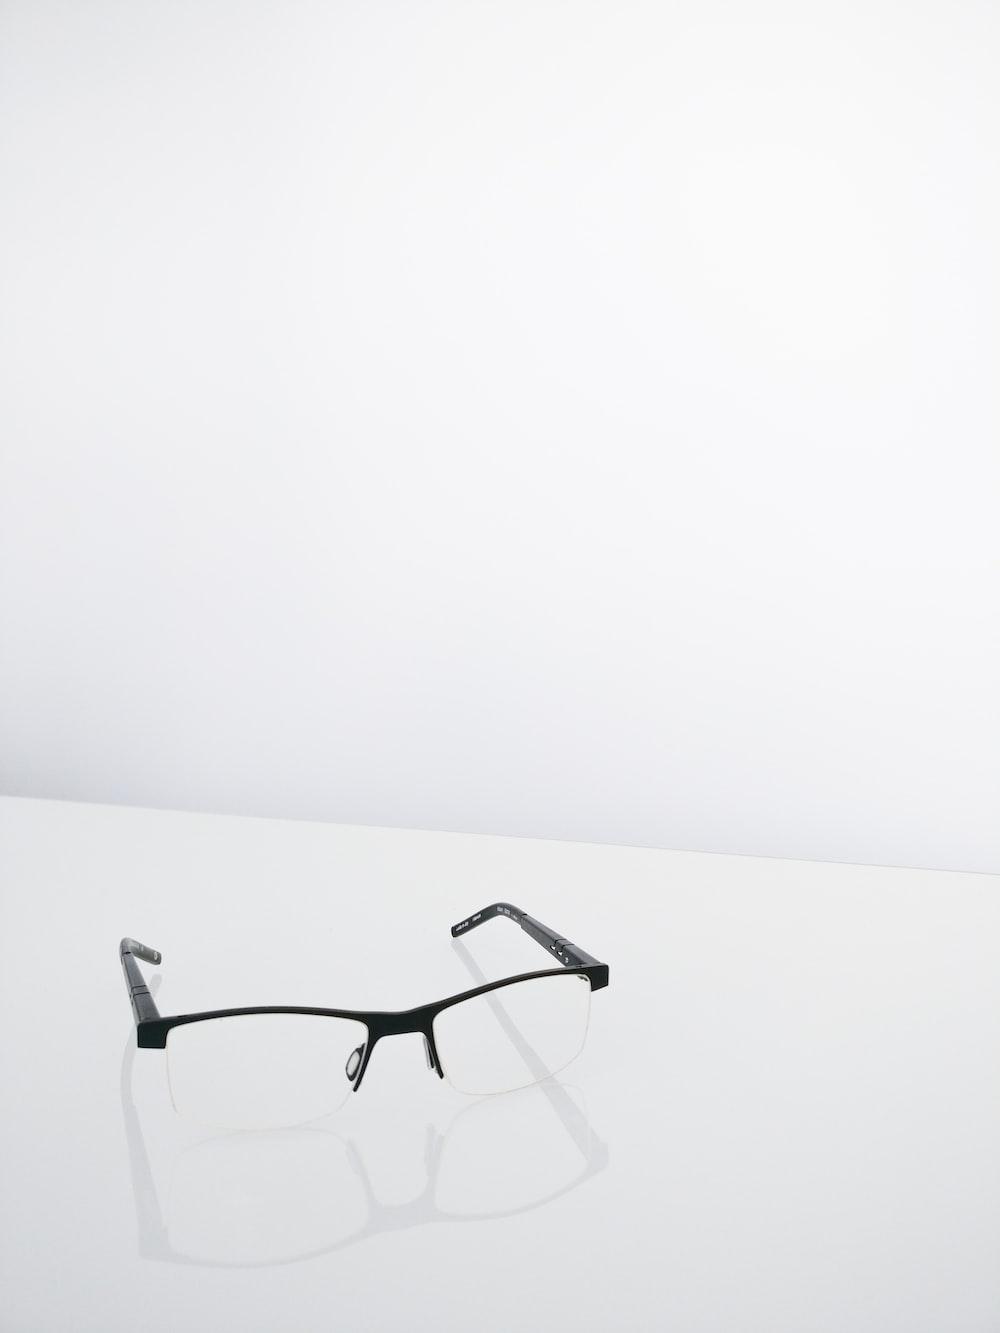 pair of black half framed eyeglasses